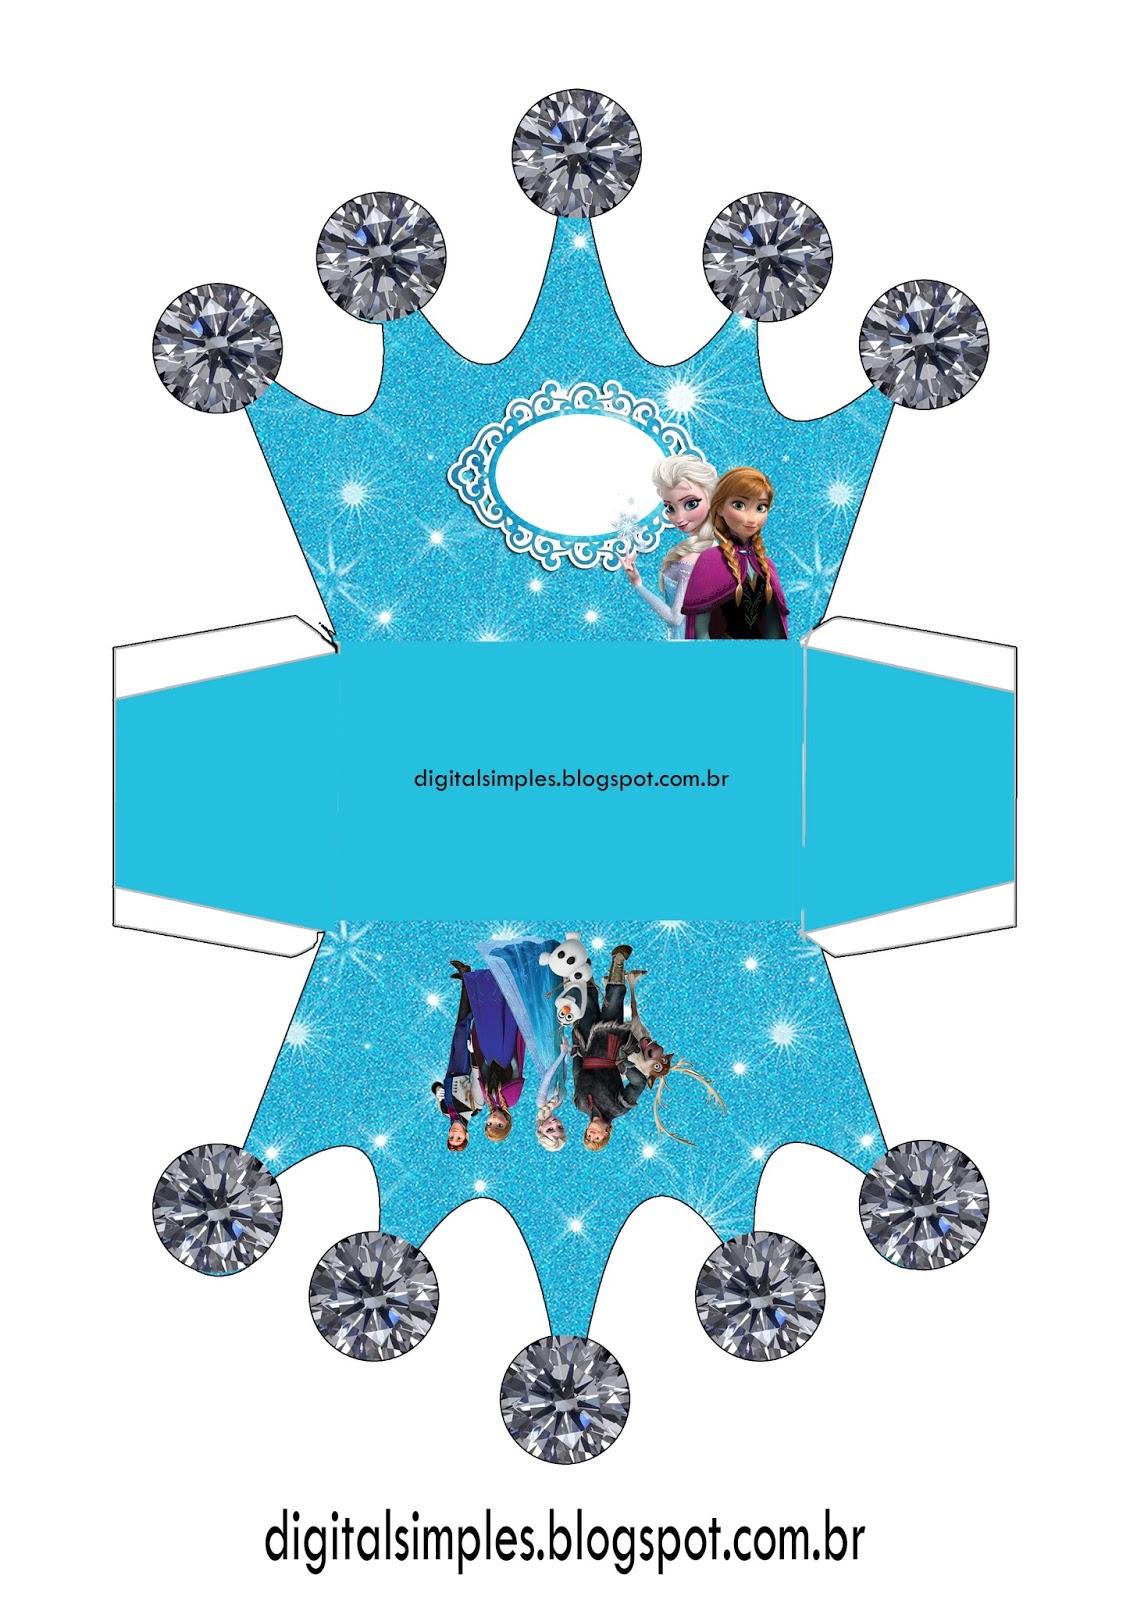 Favoritos Festa Tema Frozen para Imprimir Grátis - Convites Digitais Simples JJ06